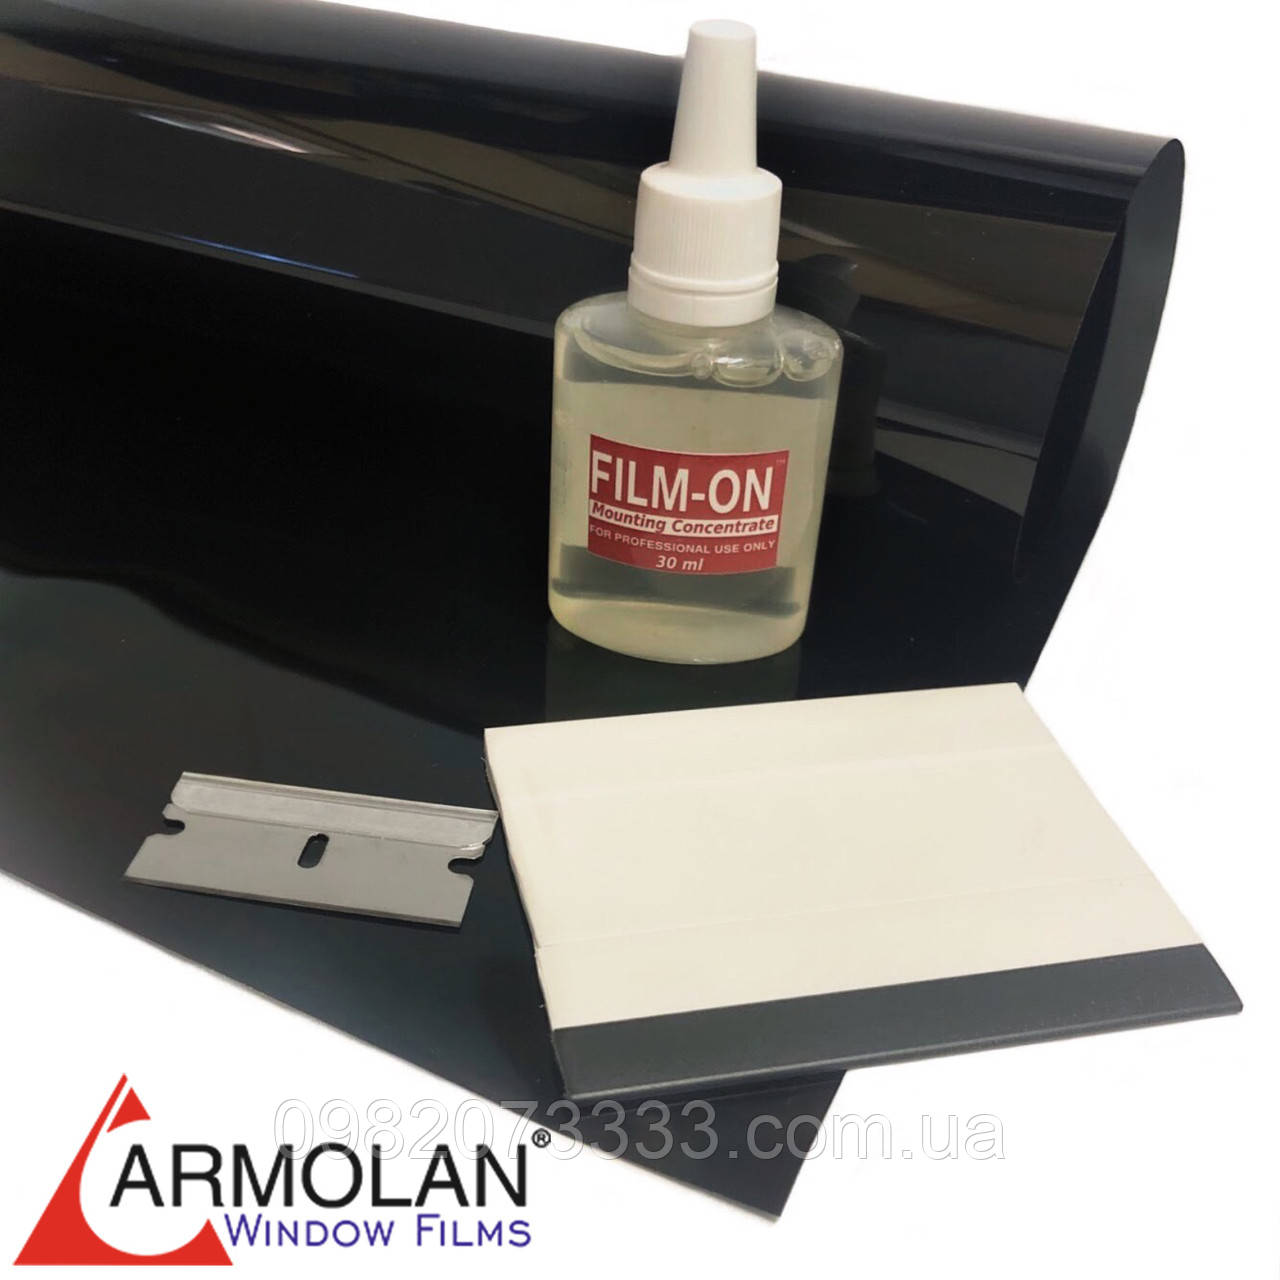 Тонировочная плёнка HP Carbon 20 (размер 0,75х3м) + инструмент для тонировки авто Armolan США цена за комплект